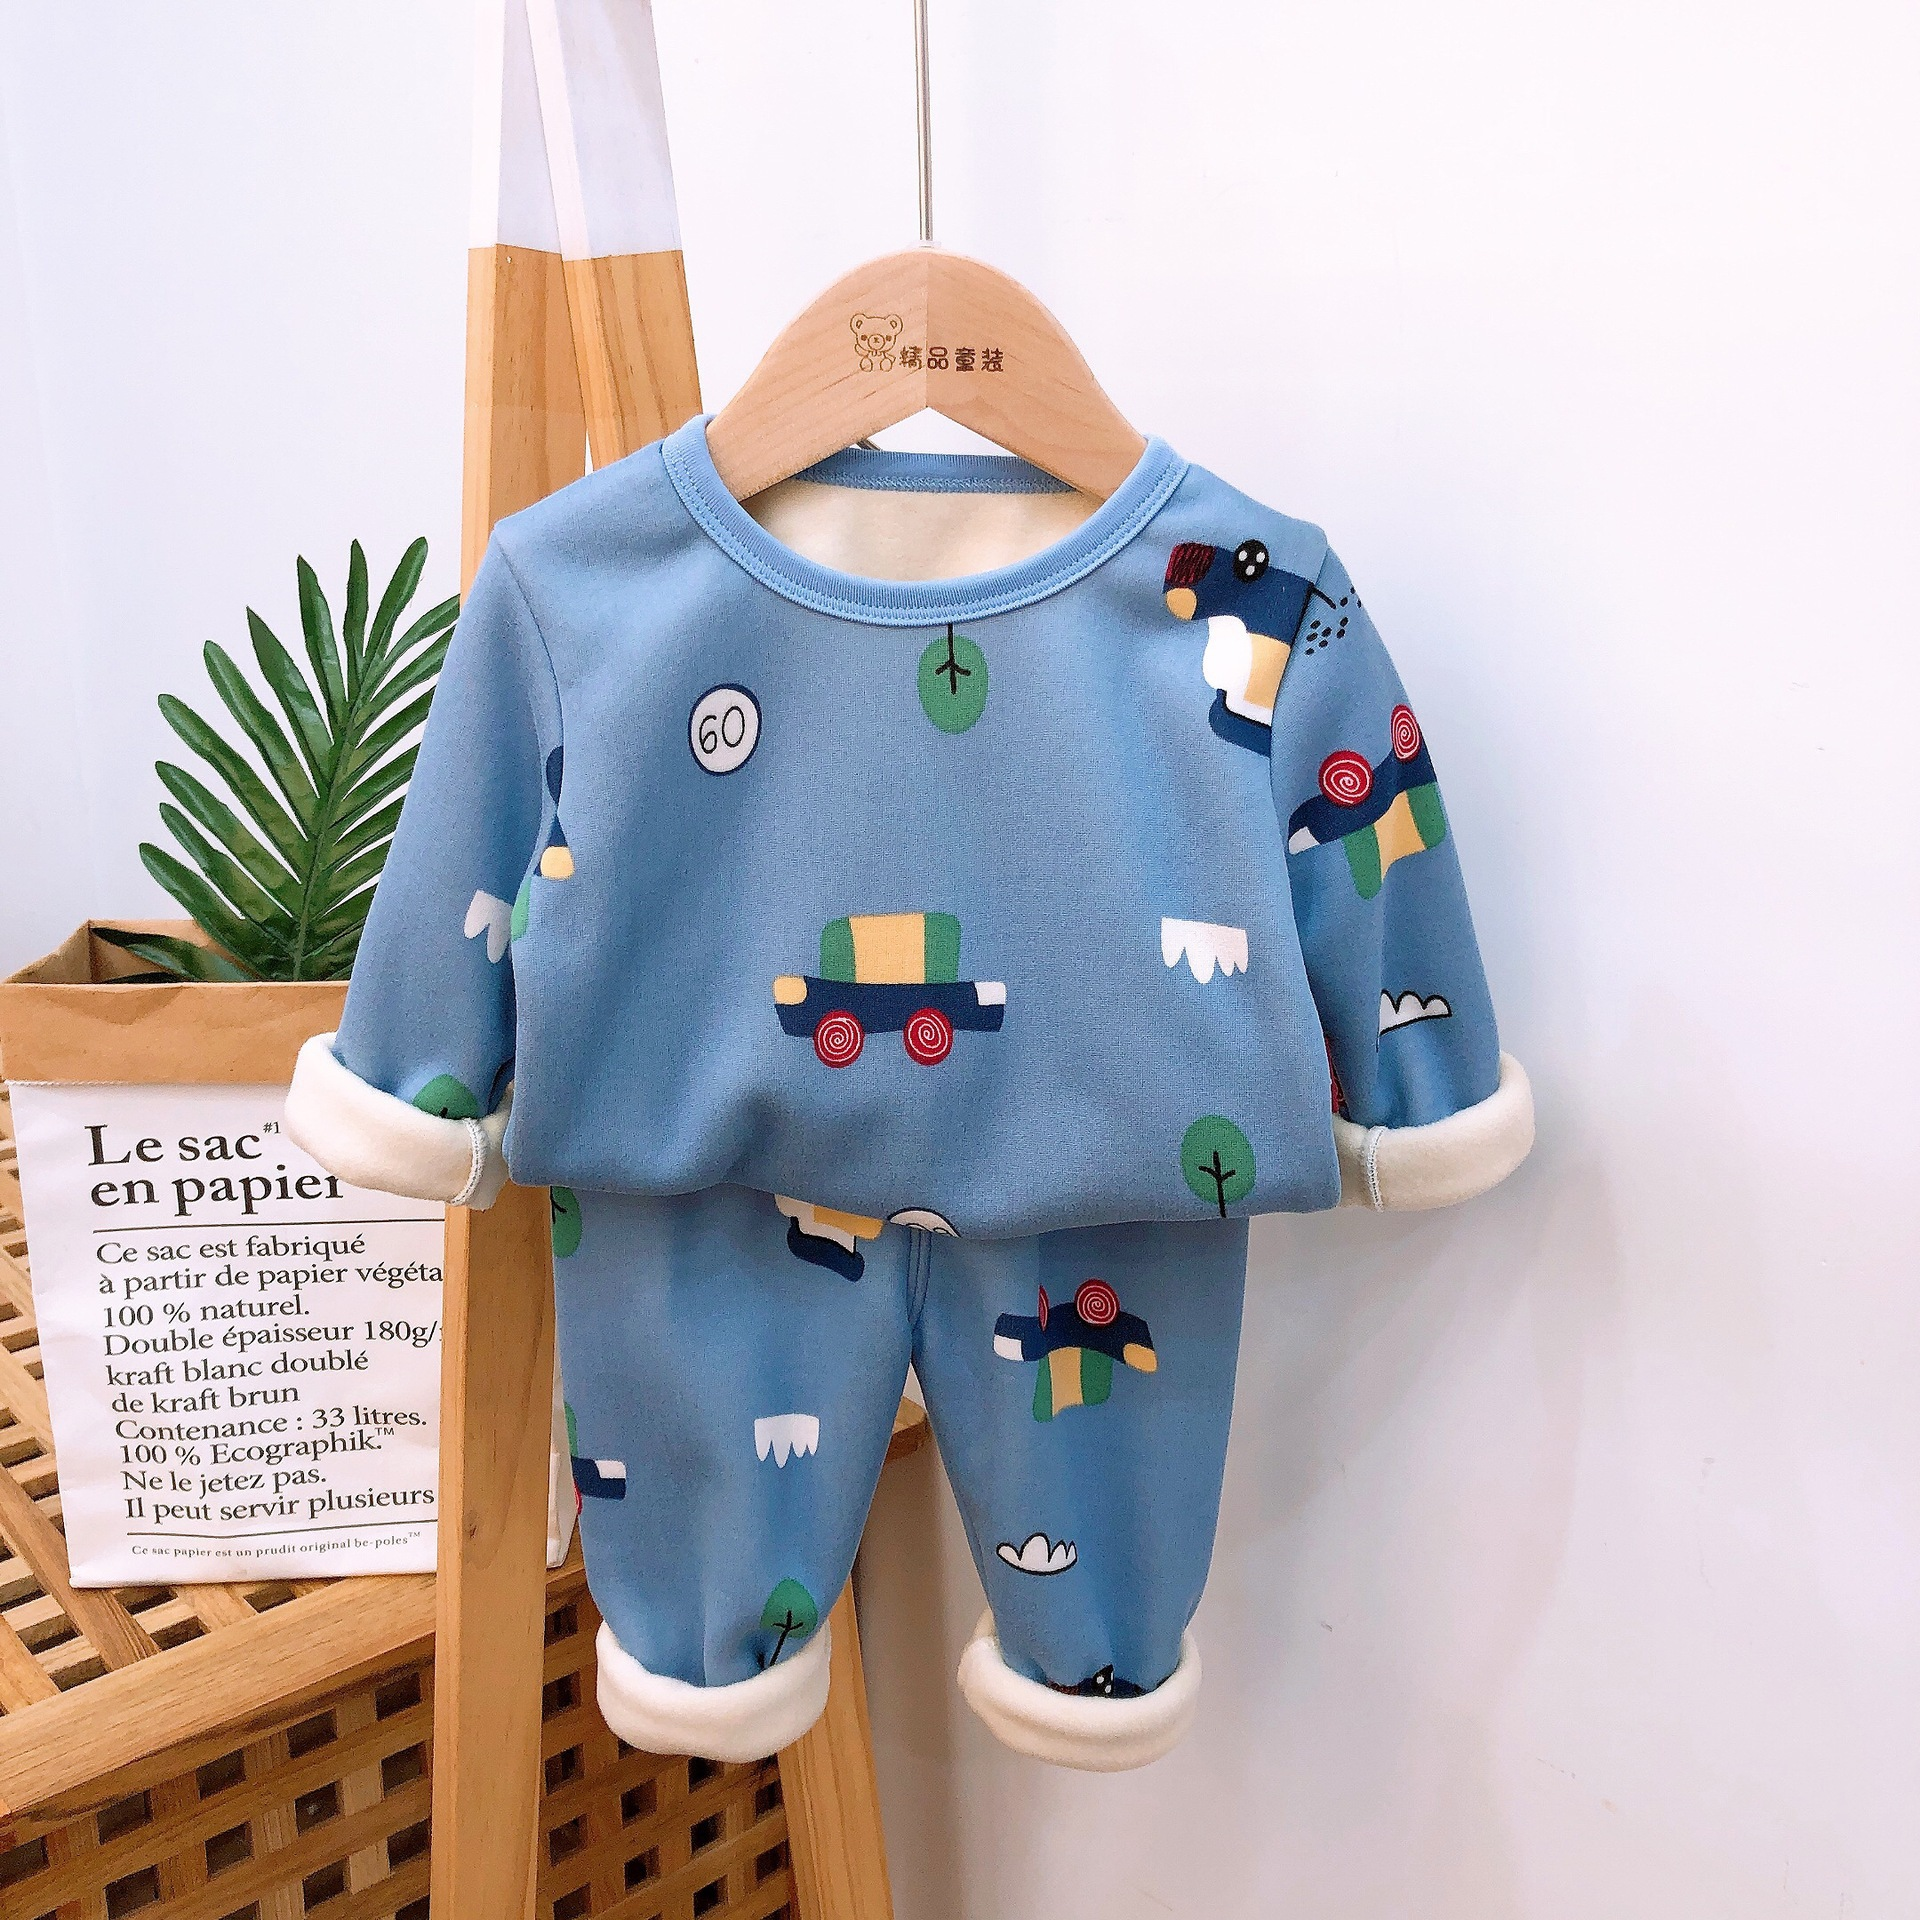 2021 Autumn Winter Thicken Velvet Children Pajamas Cartoon Family Boys Girls Clothing Set Kids Casual Sleepwear Suits Clothes 6